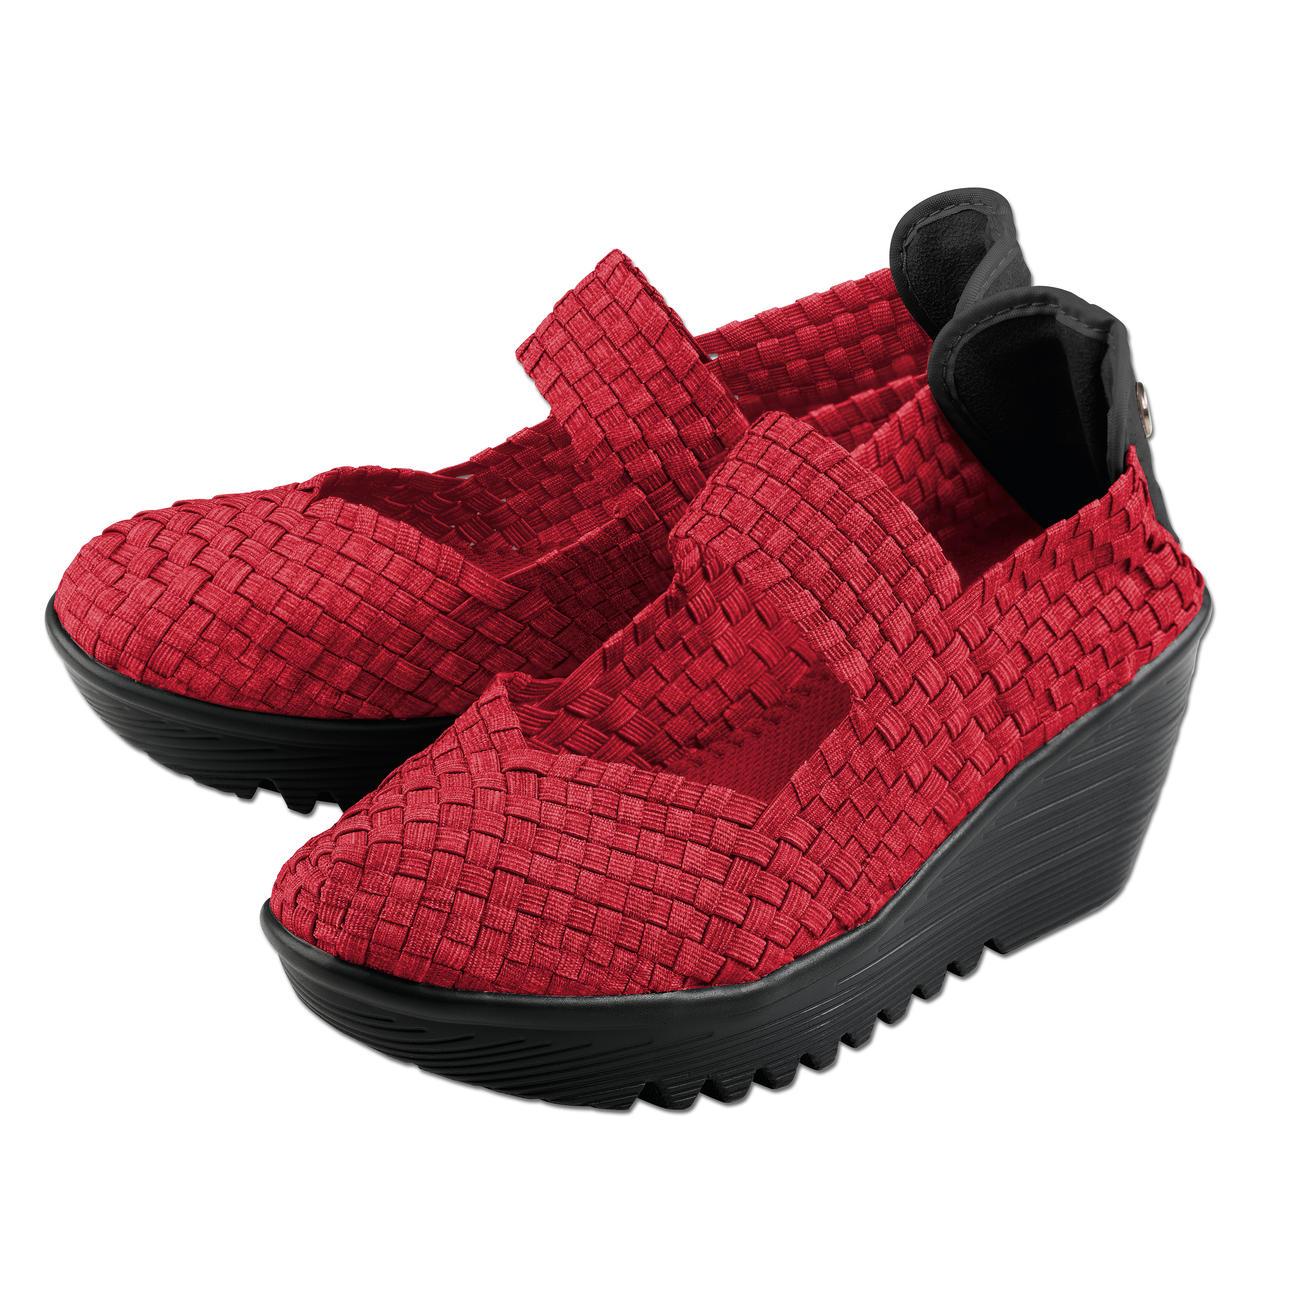 chaussures de ville impermeables femme. Black Bedroom Furniture Sets. Home Design Ideas